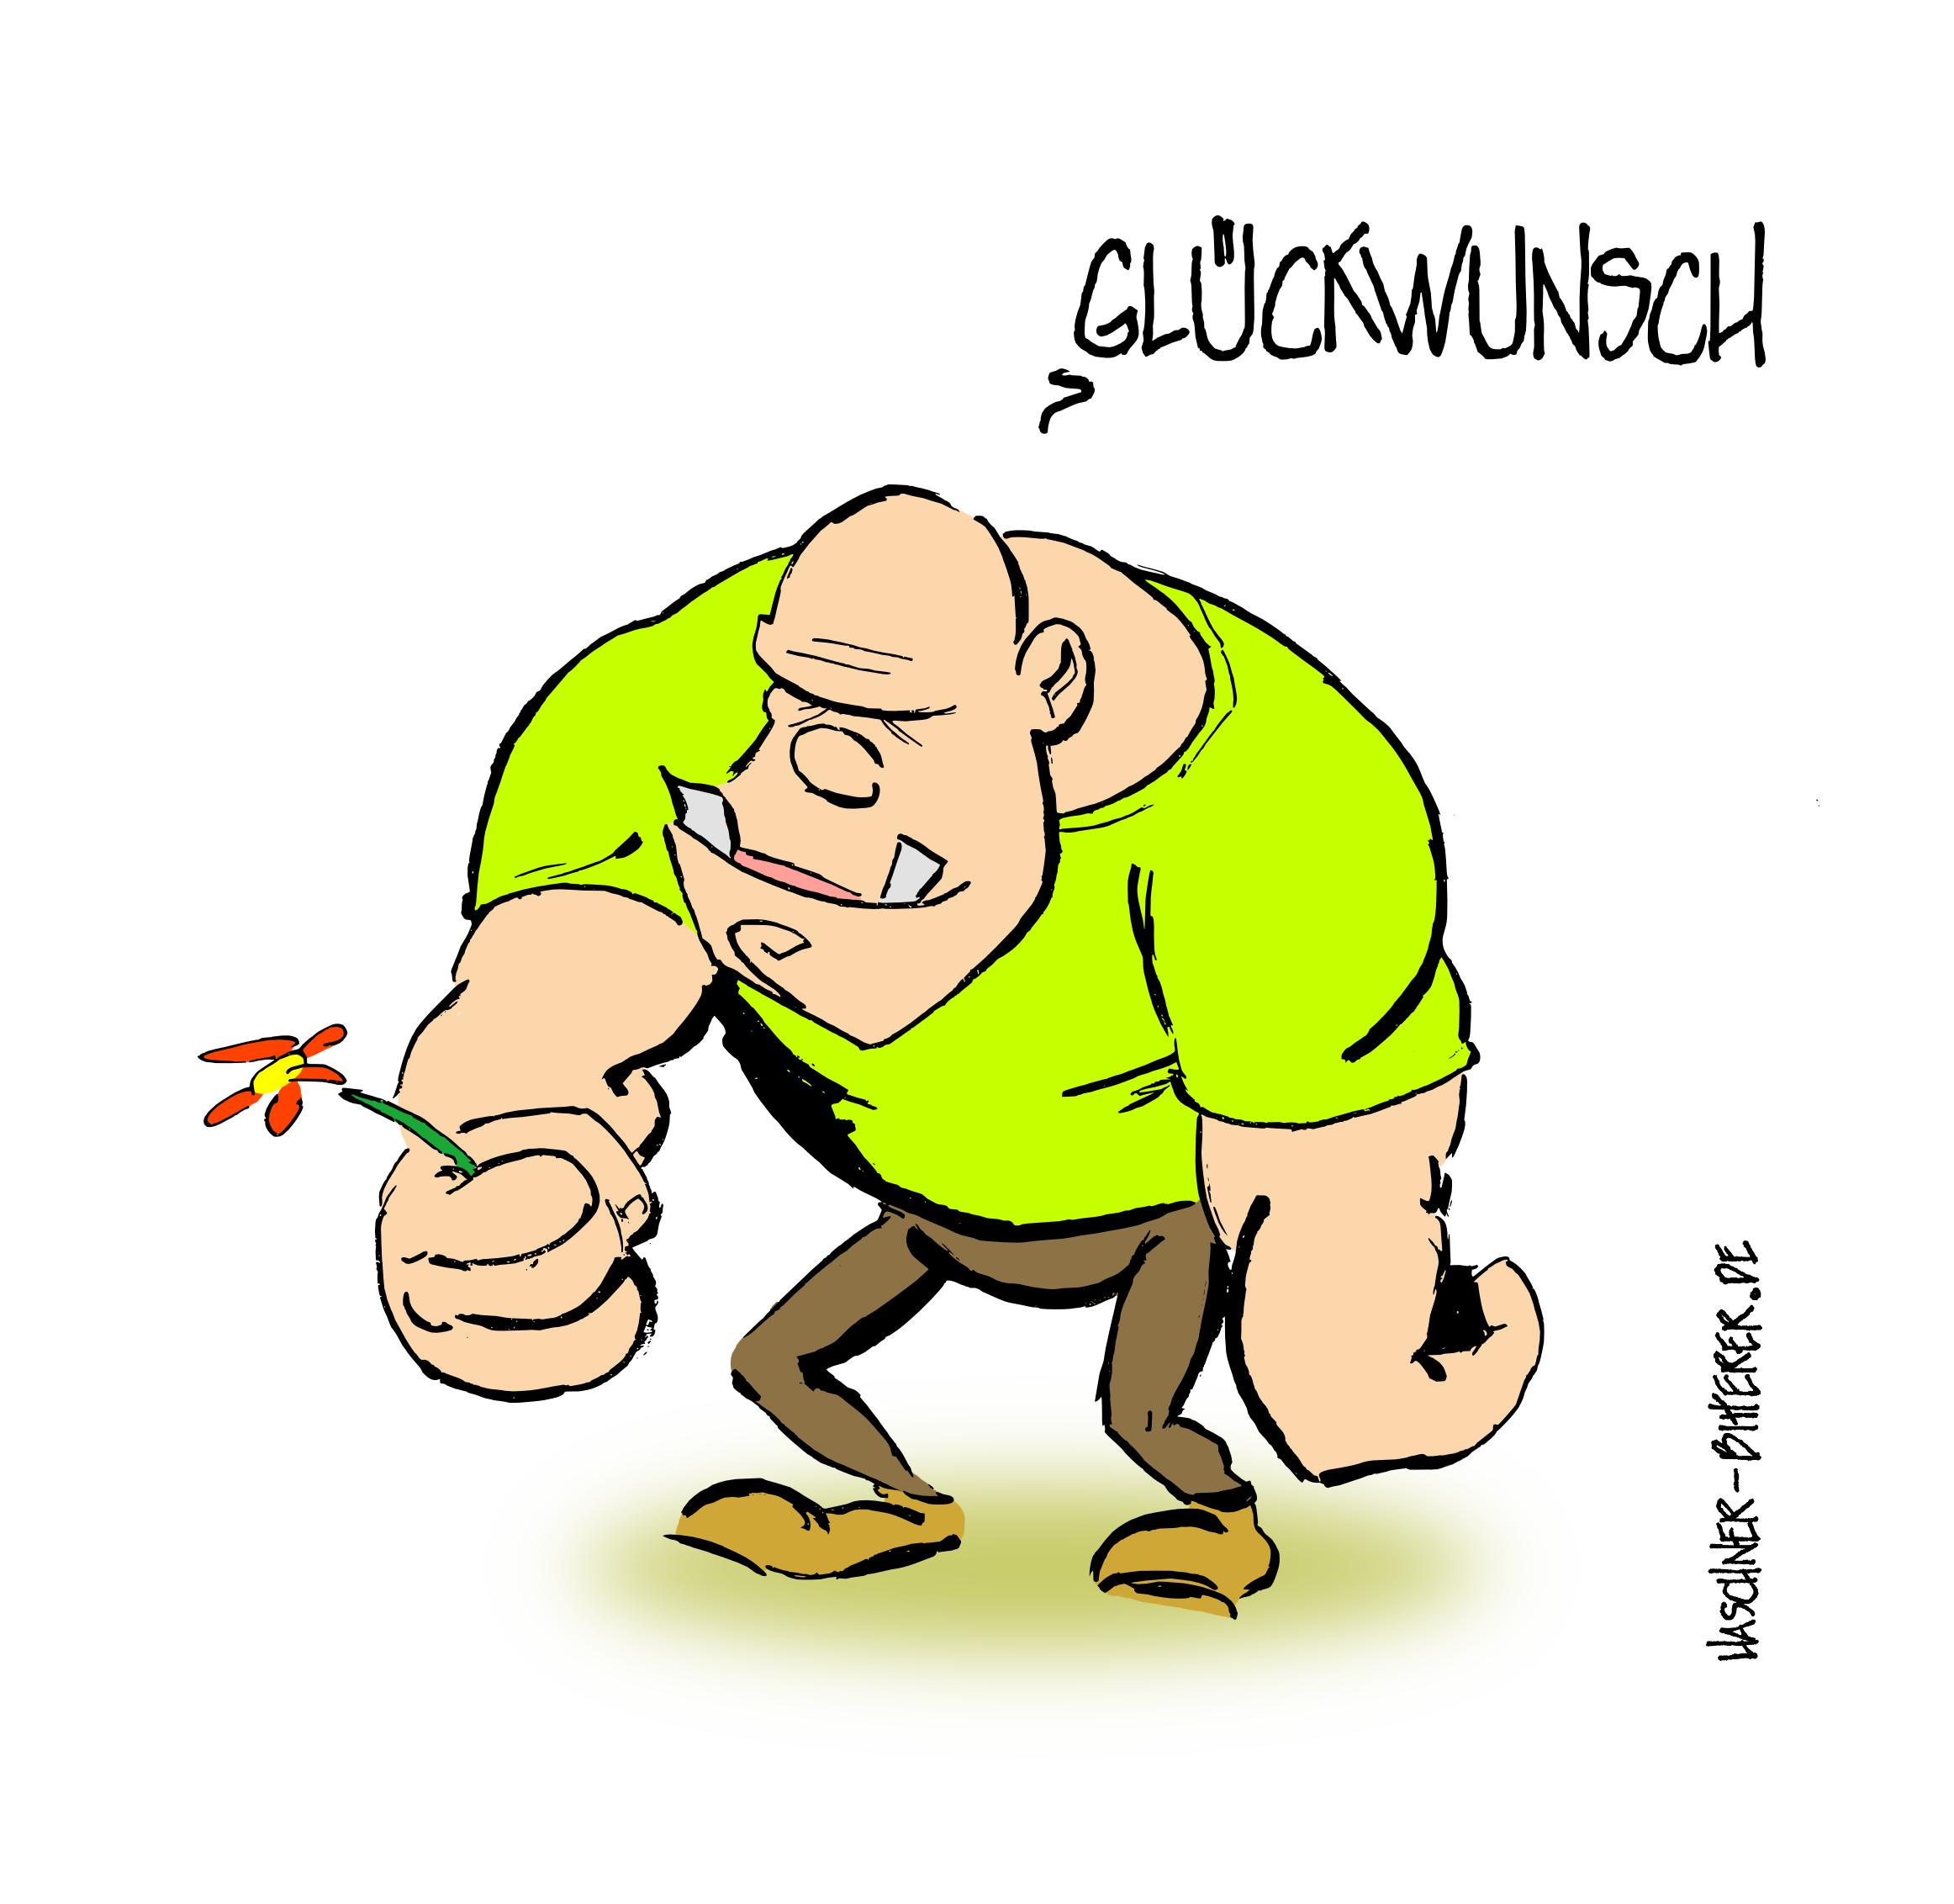 awww.abnehmen_aktuell.de_images_abnehmen_bilder_2013_06_494830d2c5160020151d32b05530d2b25d57c5.png